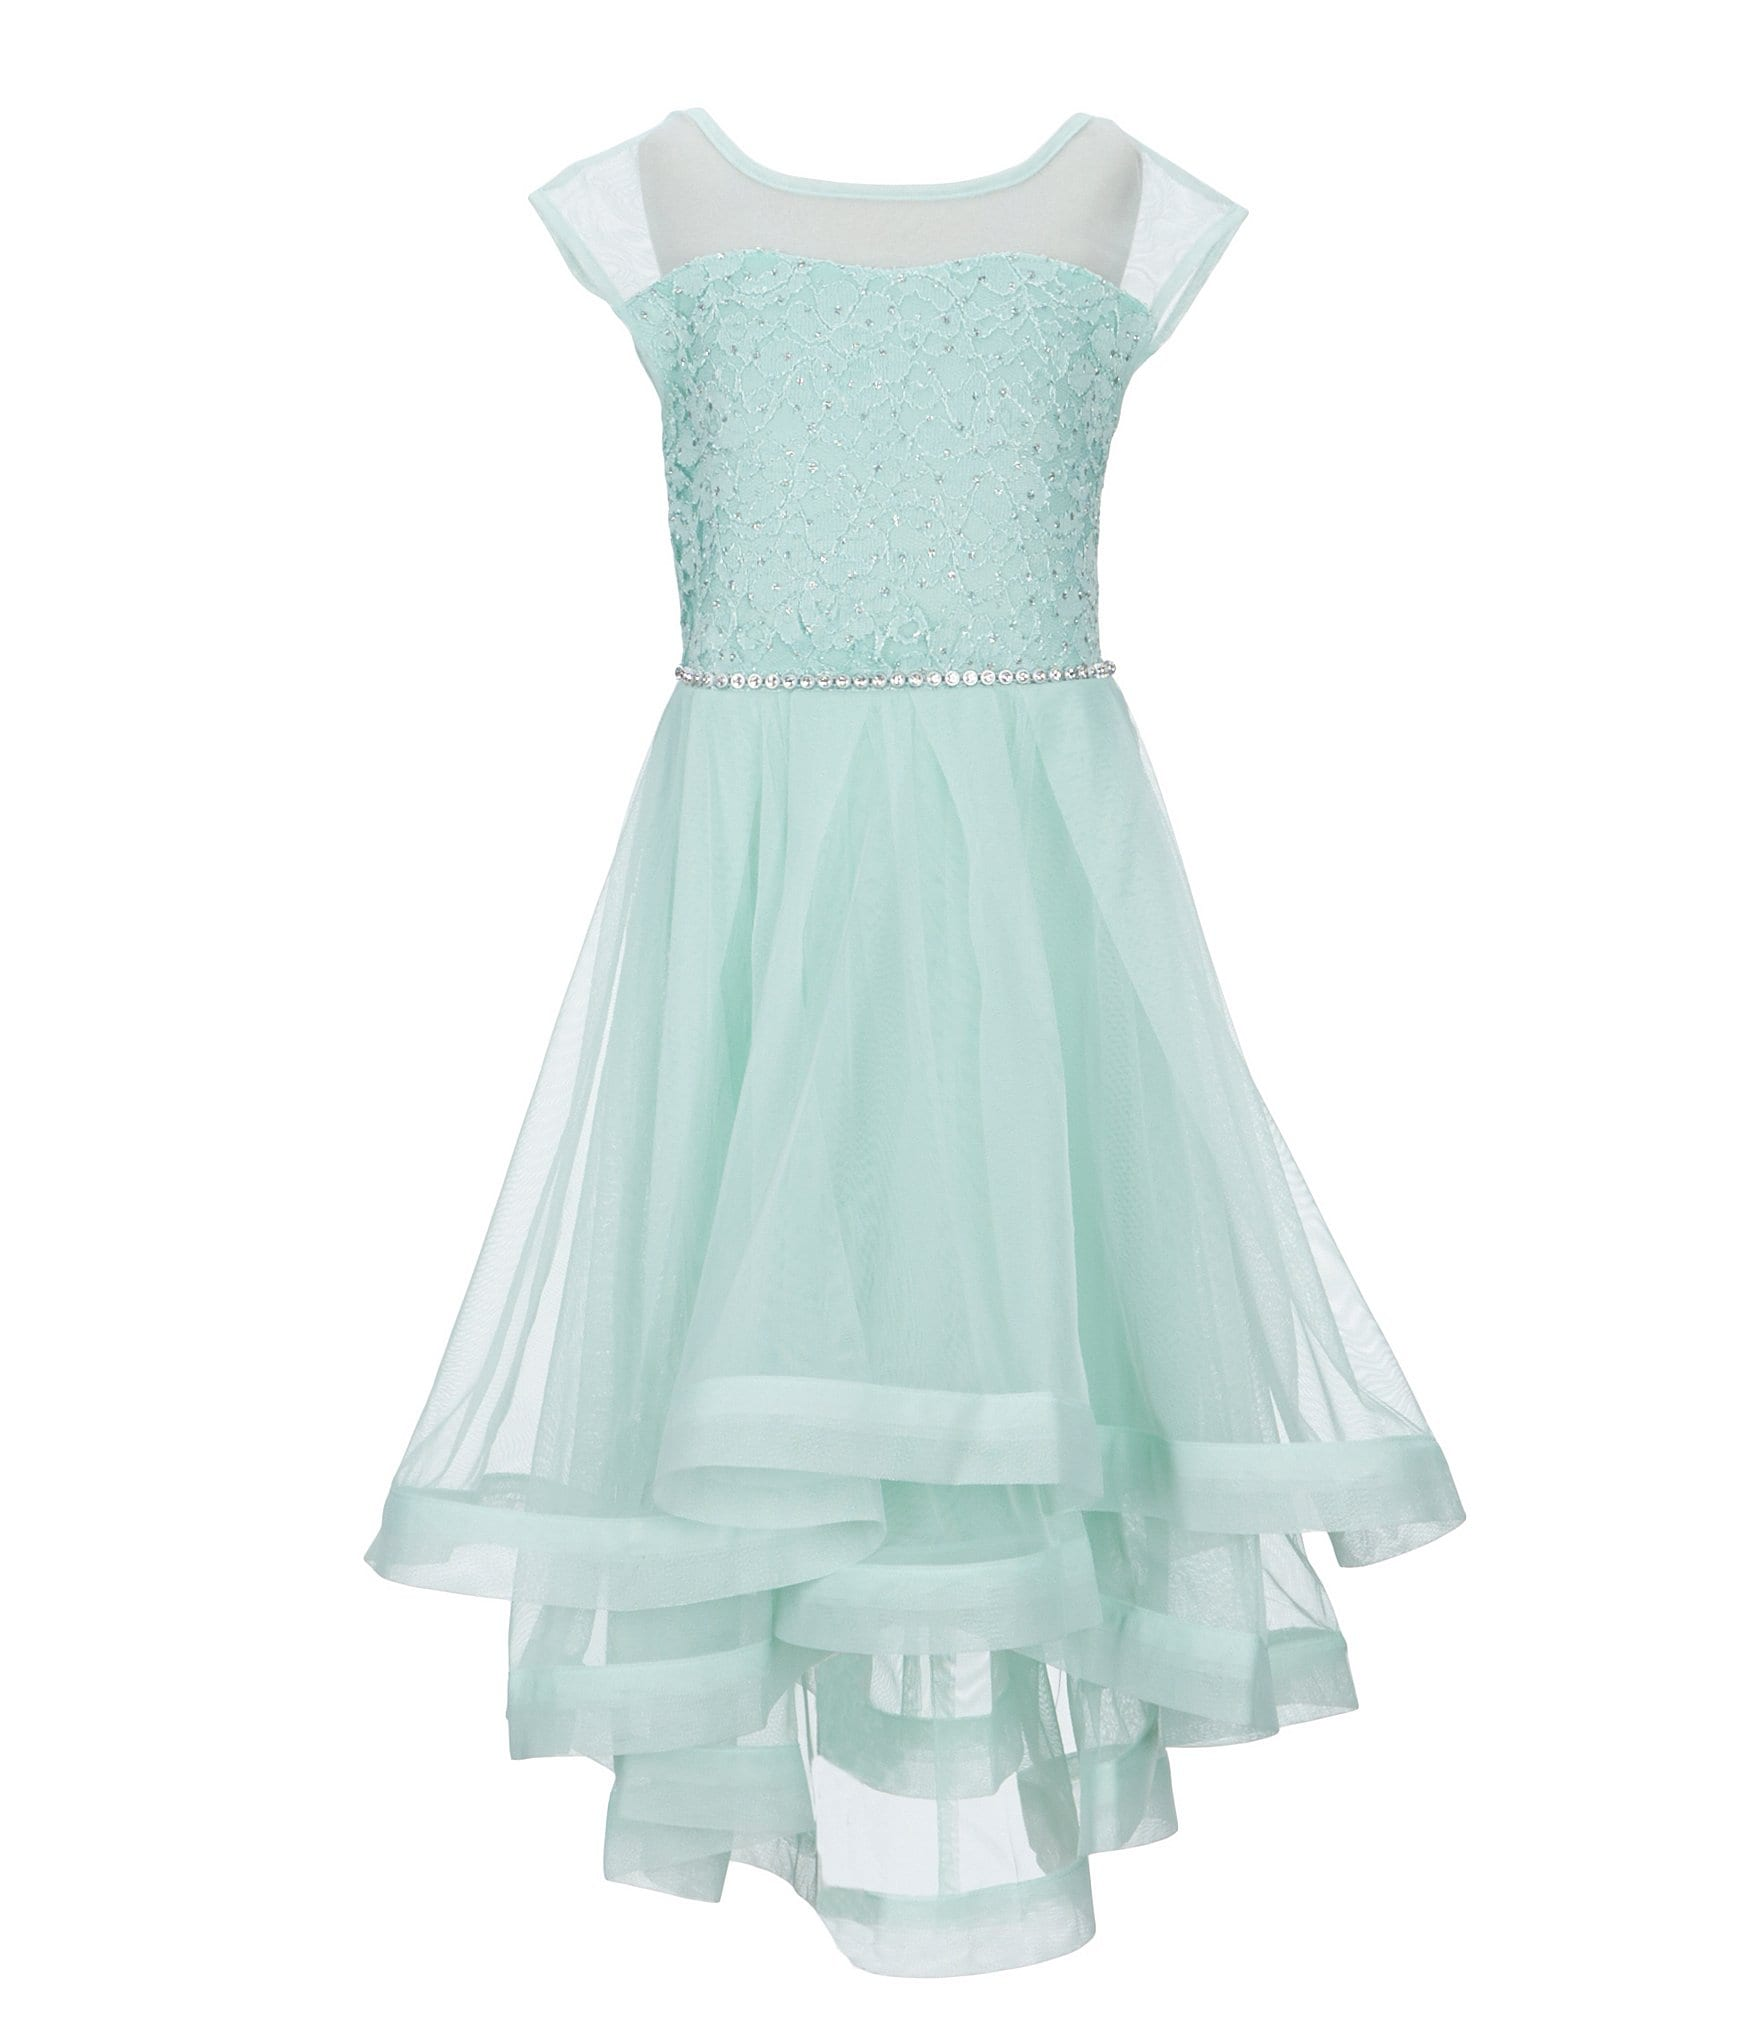 Unique Dillards Party Dress Picture Collection - All Wedding Dresses ...